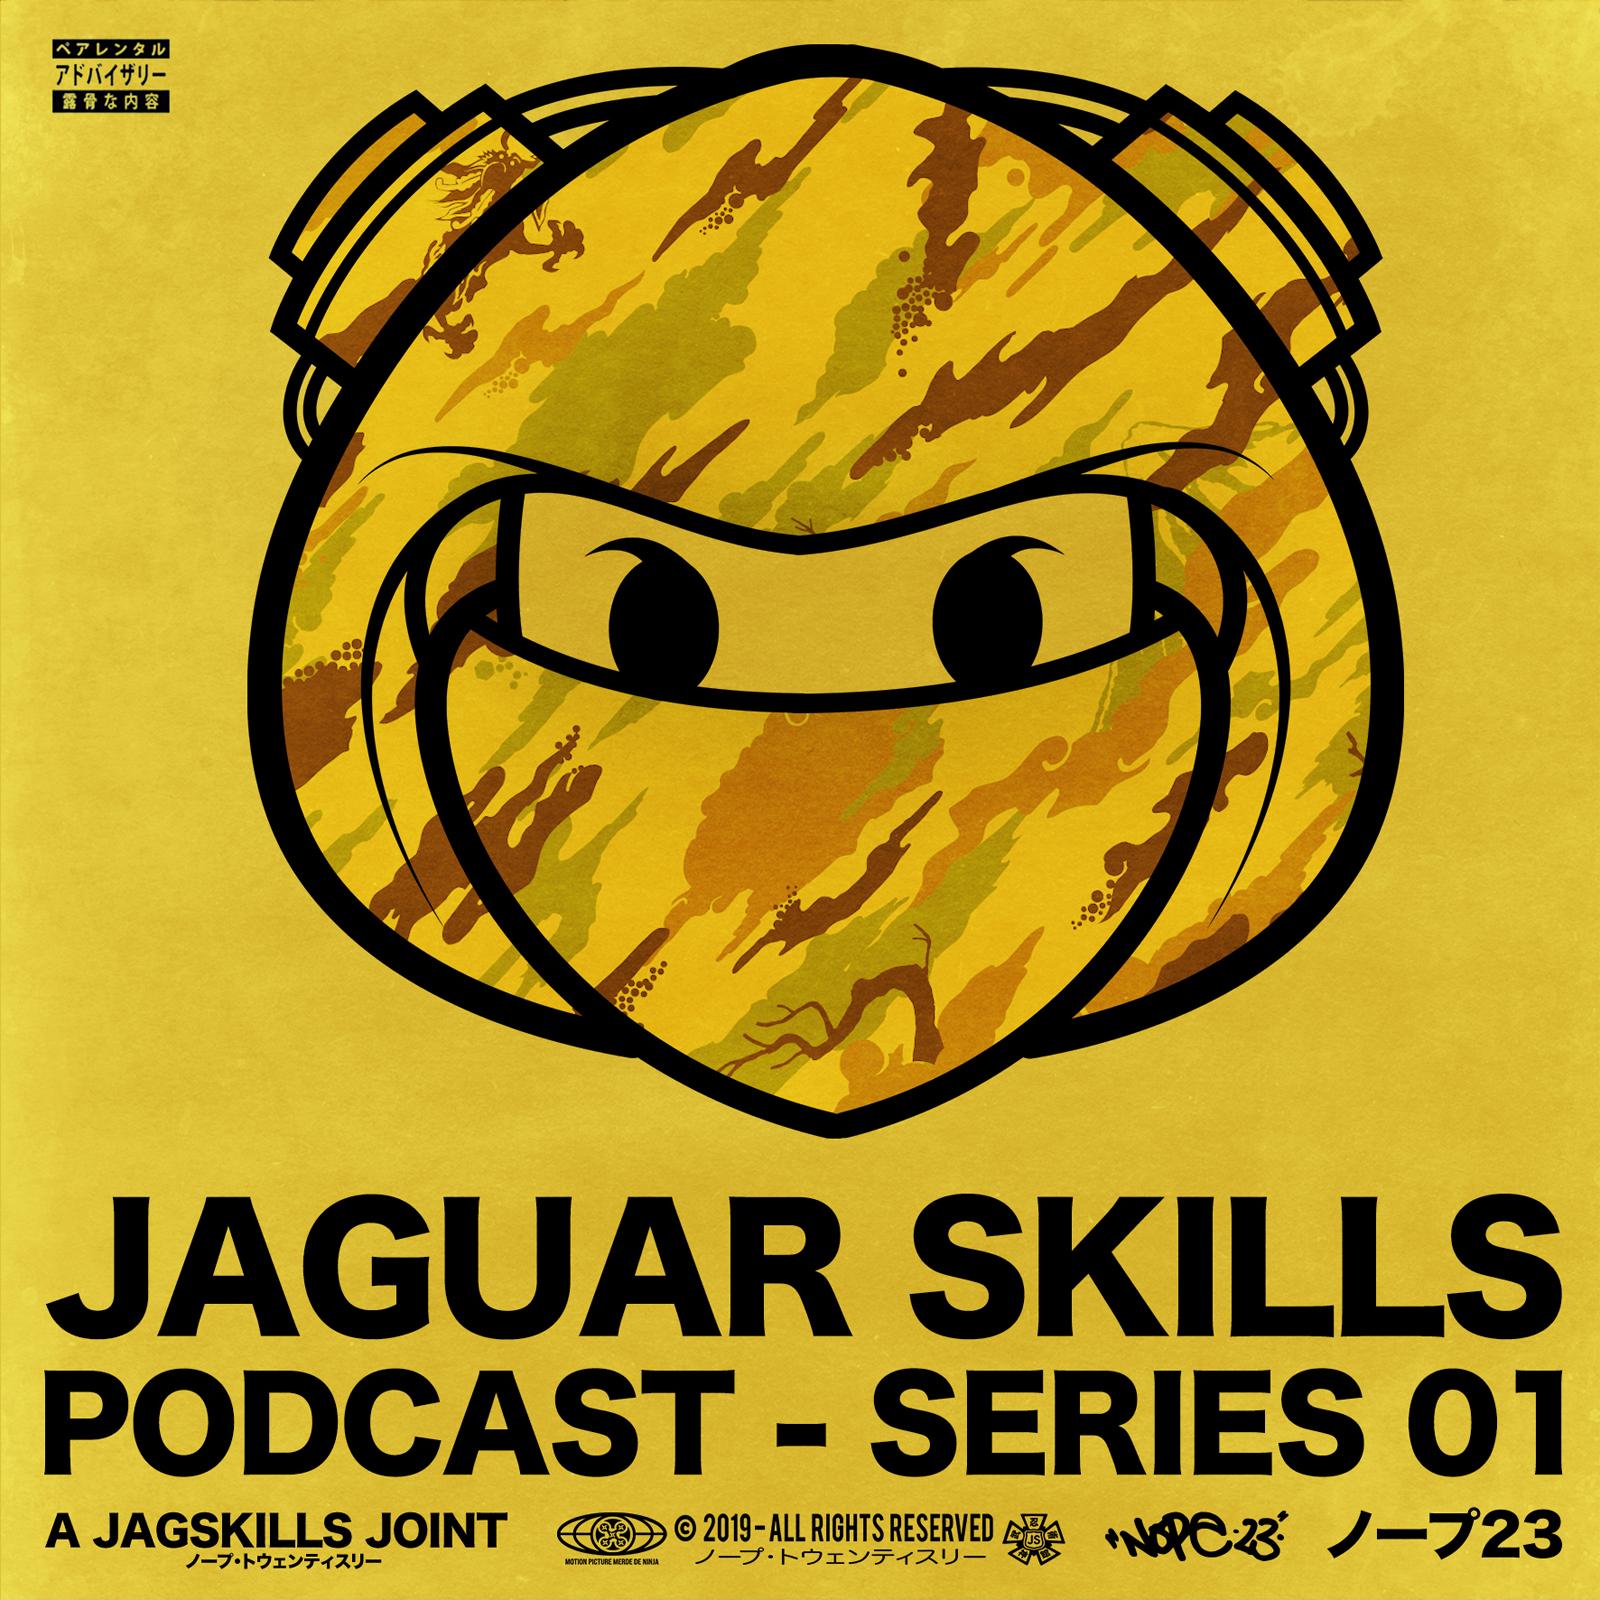 Jaguar Skills Super Mix on Apple Podcasts